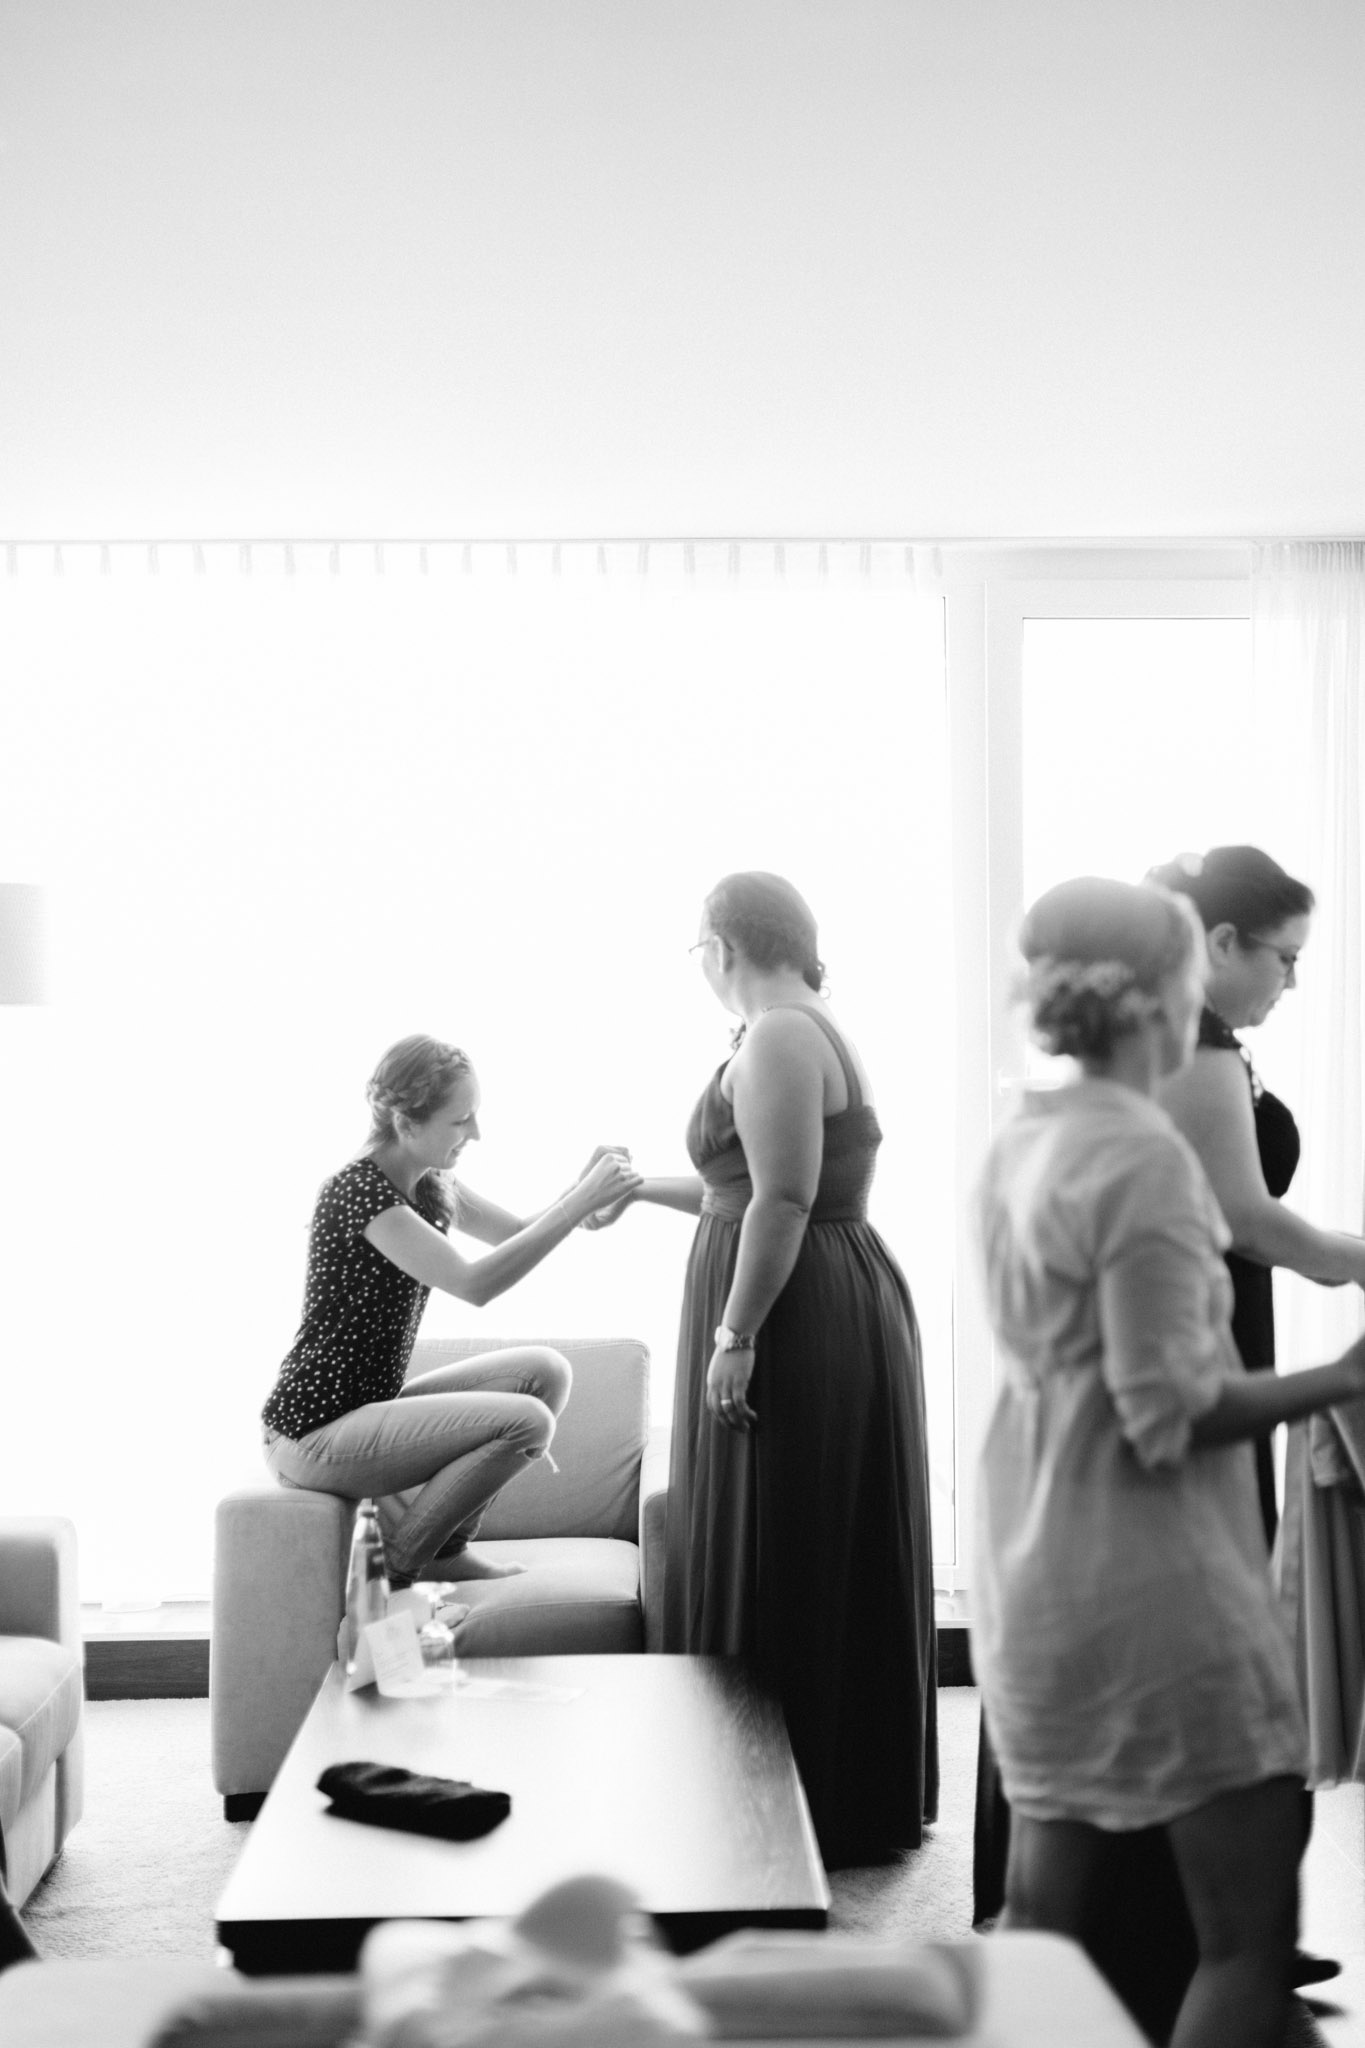 Lilienhof-Freiburg-Hochzeit-Pia-Anna-Christian-Wedding-Photography-FS-8.jpg